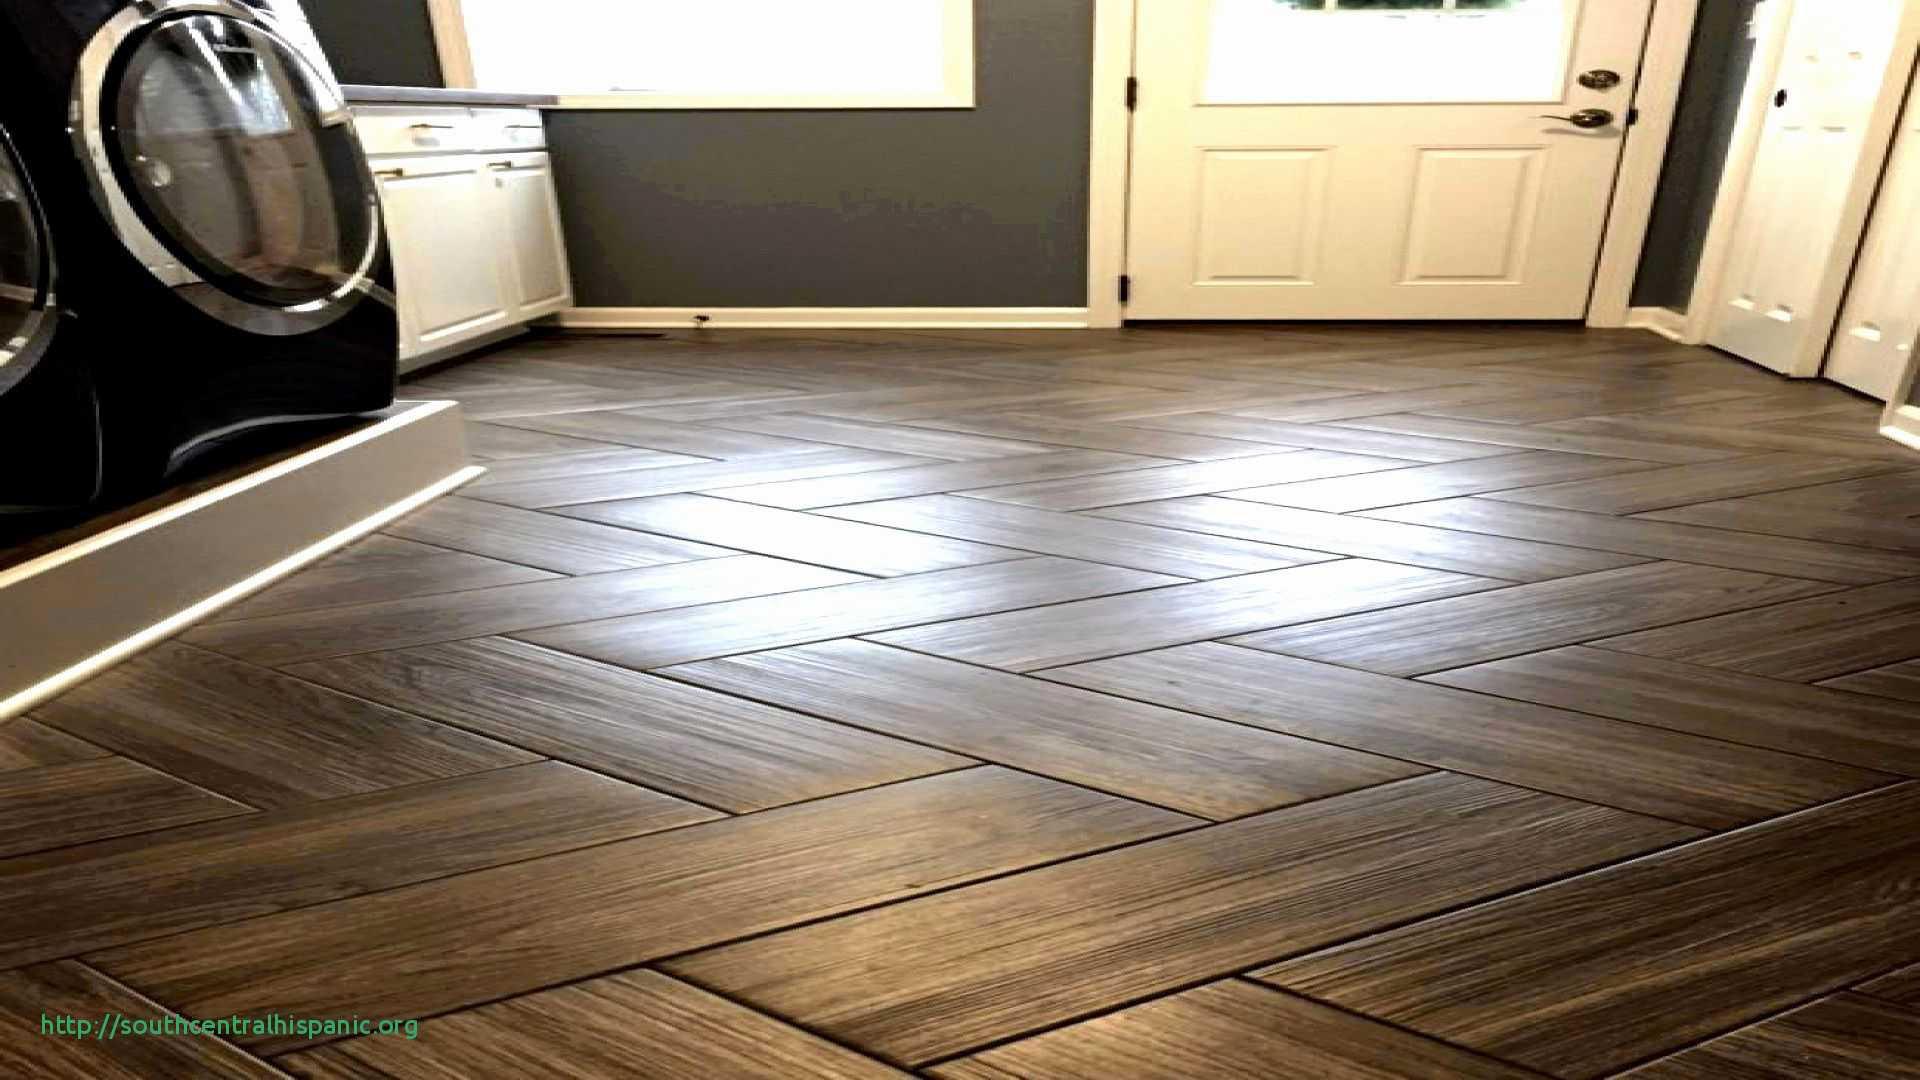 hardwood flooring sacramento ca of formaldehyde free laminate flooring dahuacctvth com for formaldehyde free laminate flooring